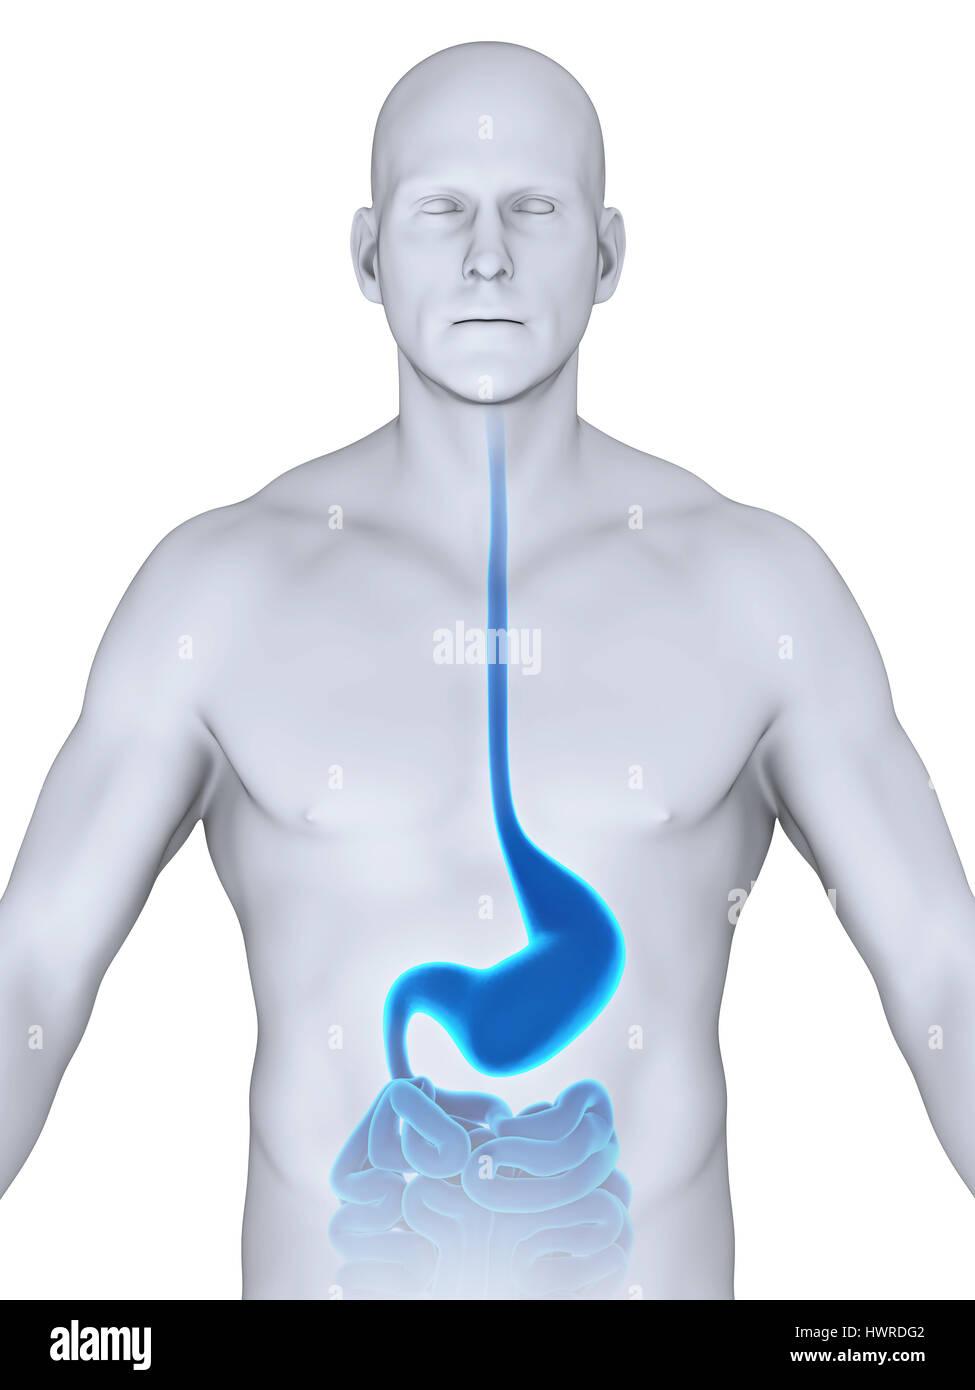 Human Stomach Anatomy Stock Photo: 136354514 - Alamy